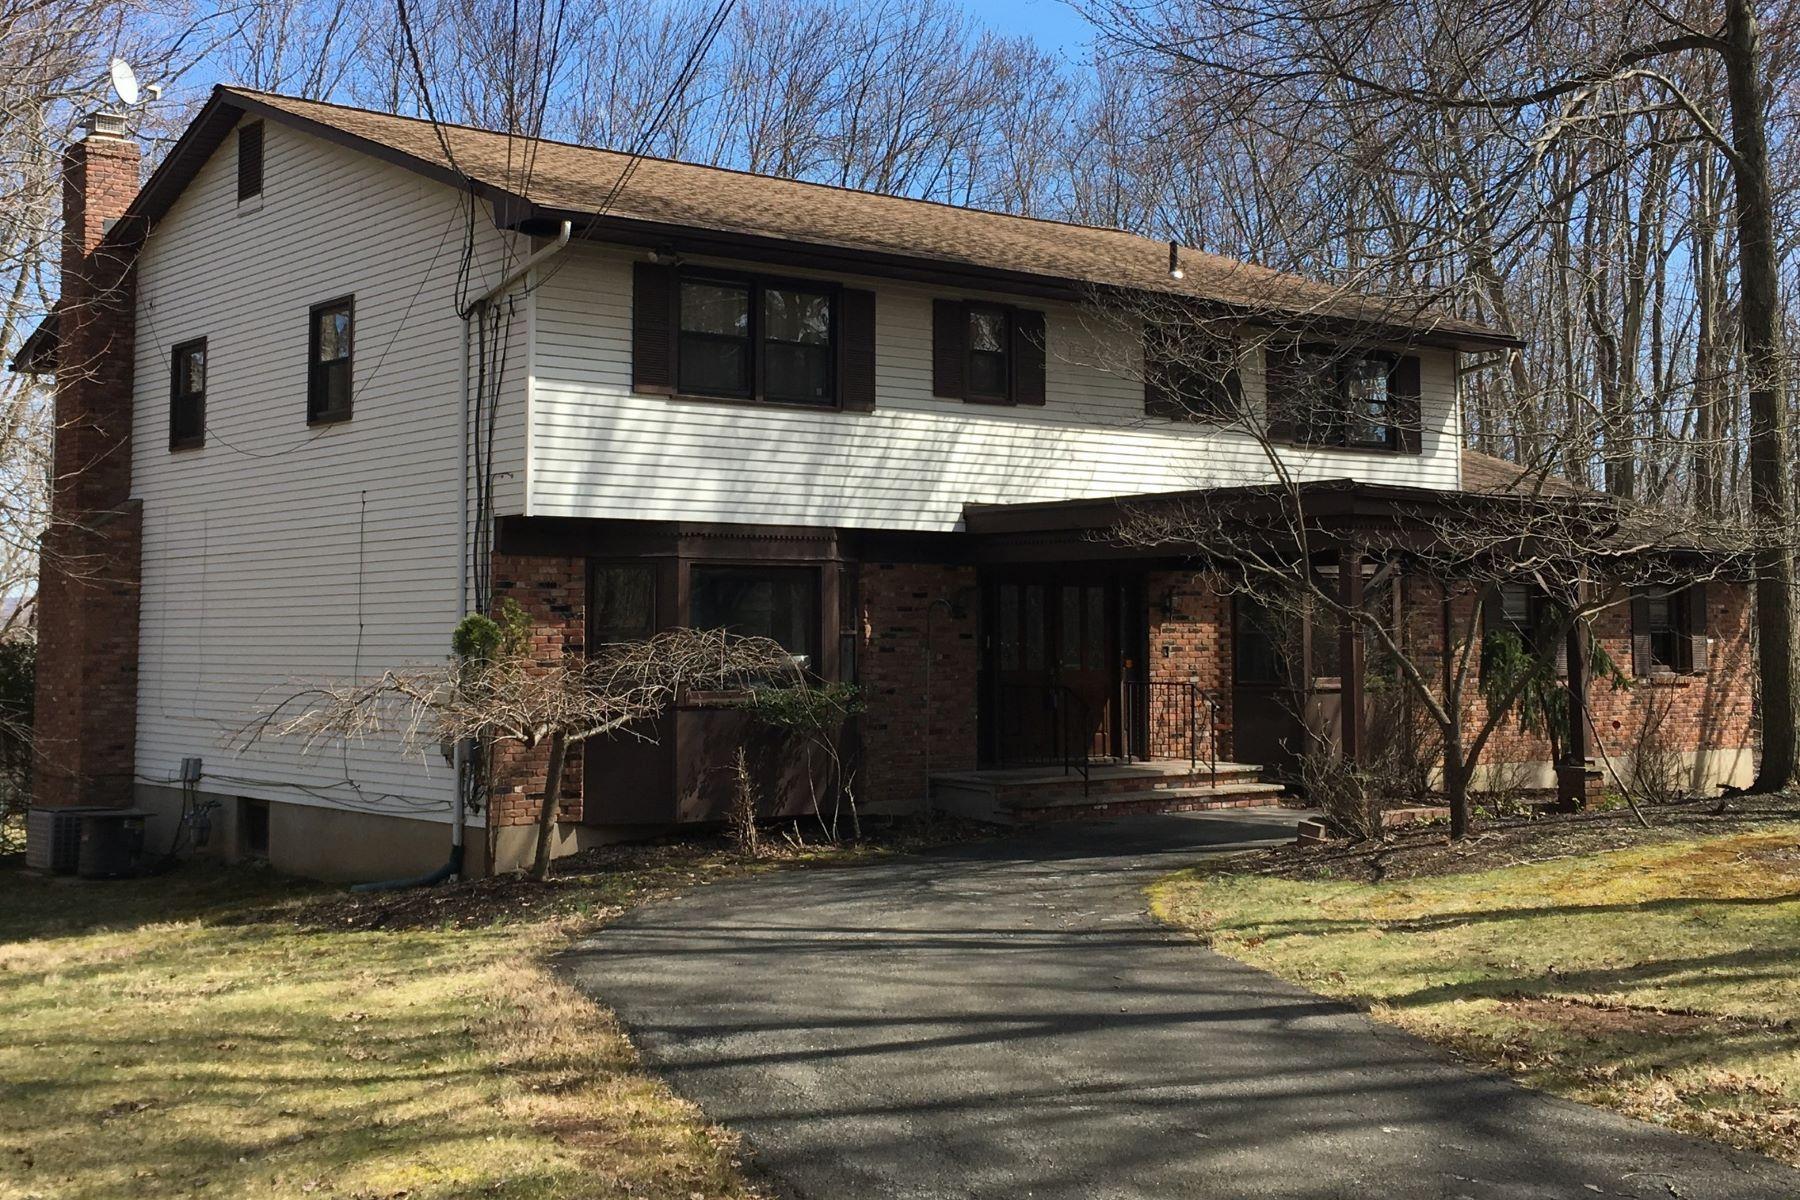 独户住宅 为 销售 在 Serene Setting 629 North Midland Ave. 奈亚克, 纽约州, 10960 美国